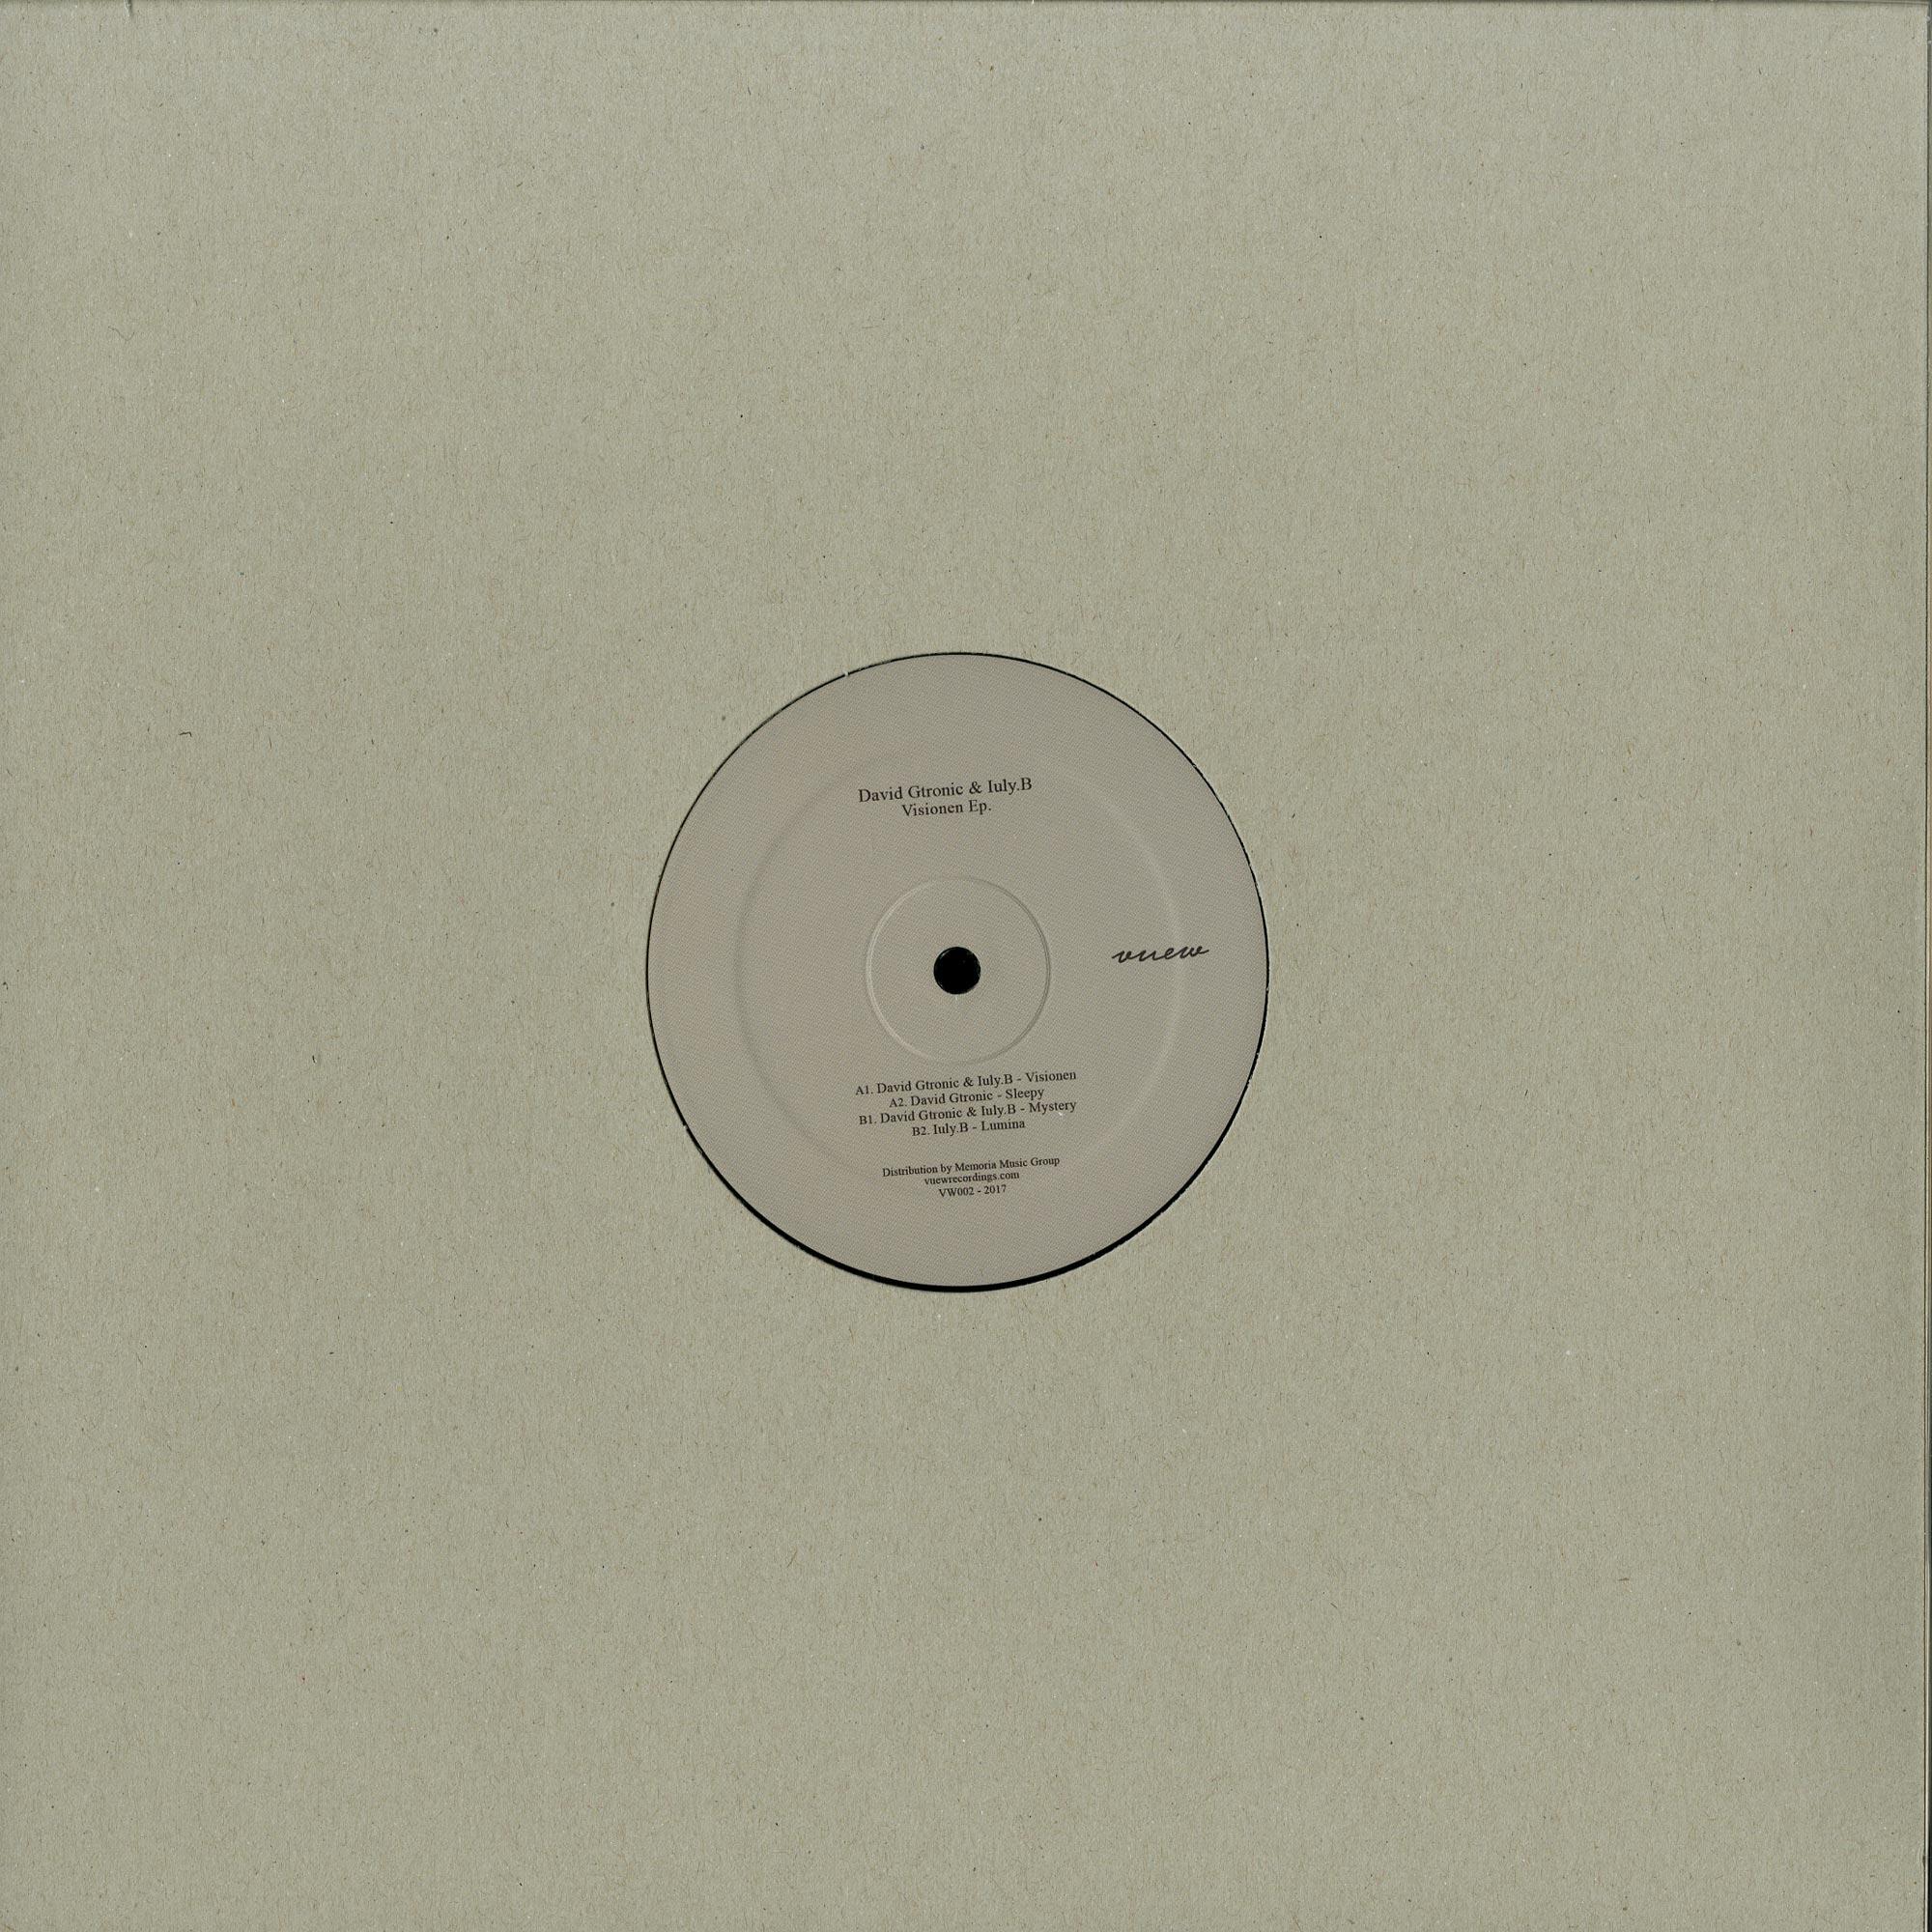 David Gtronic & Iuly.B - VISIONEN EP